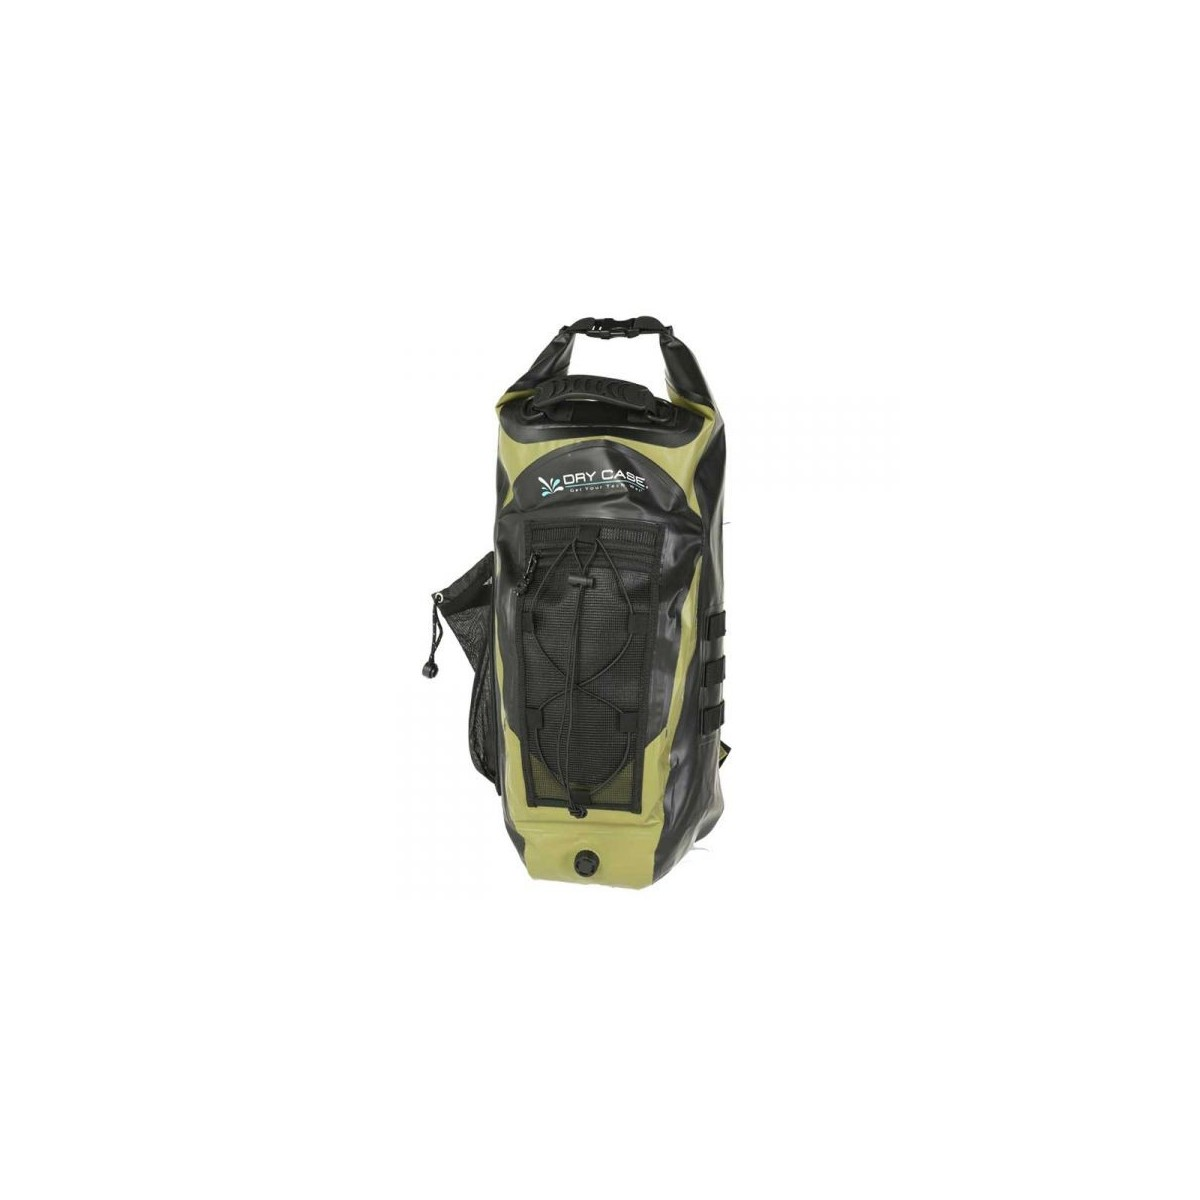 Drycase Basin 100% Waterproof Deck and Board Bag